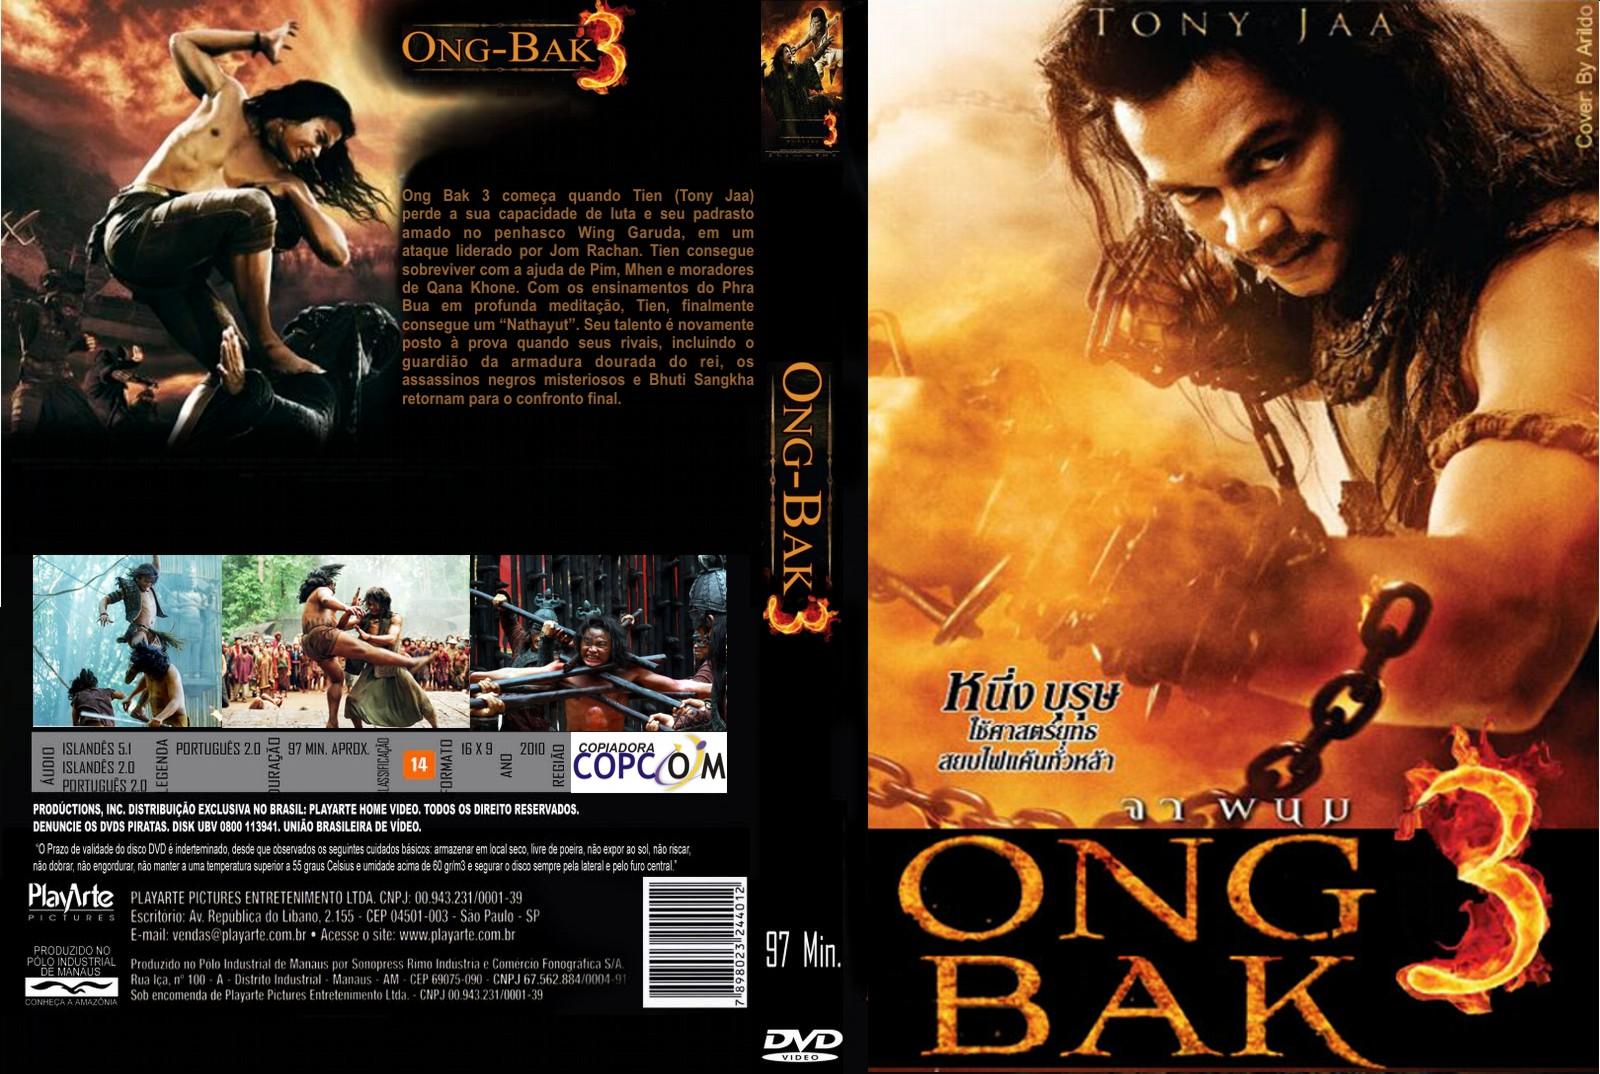 Ong bak 1 hd full movie hindi free download search results animal